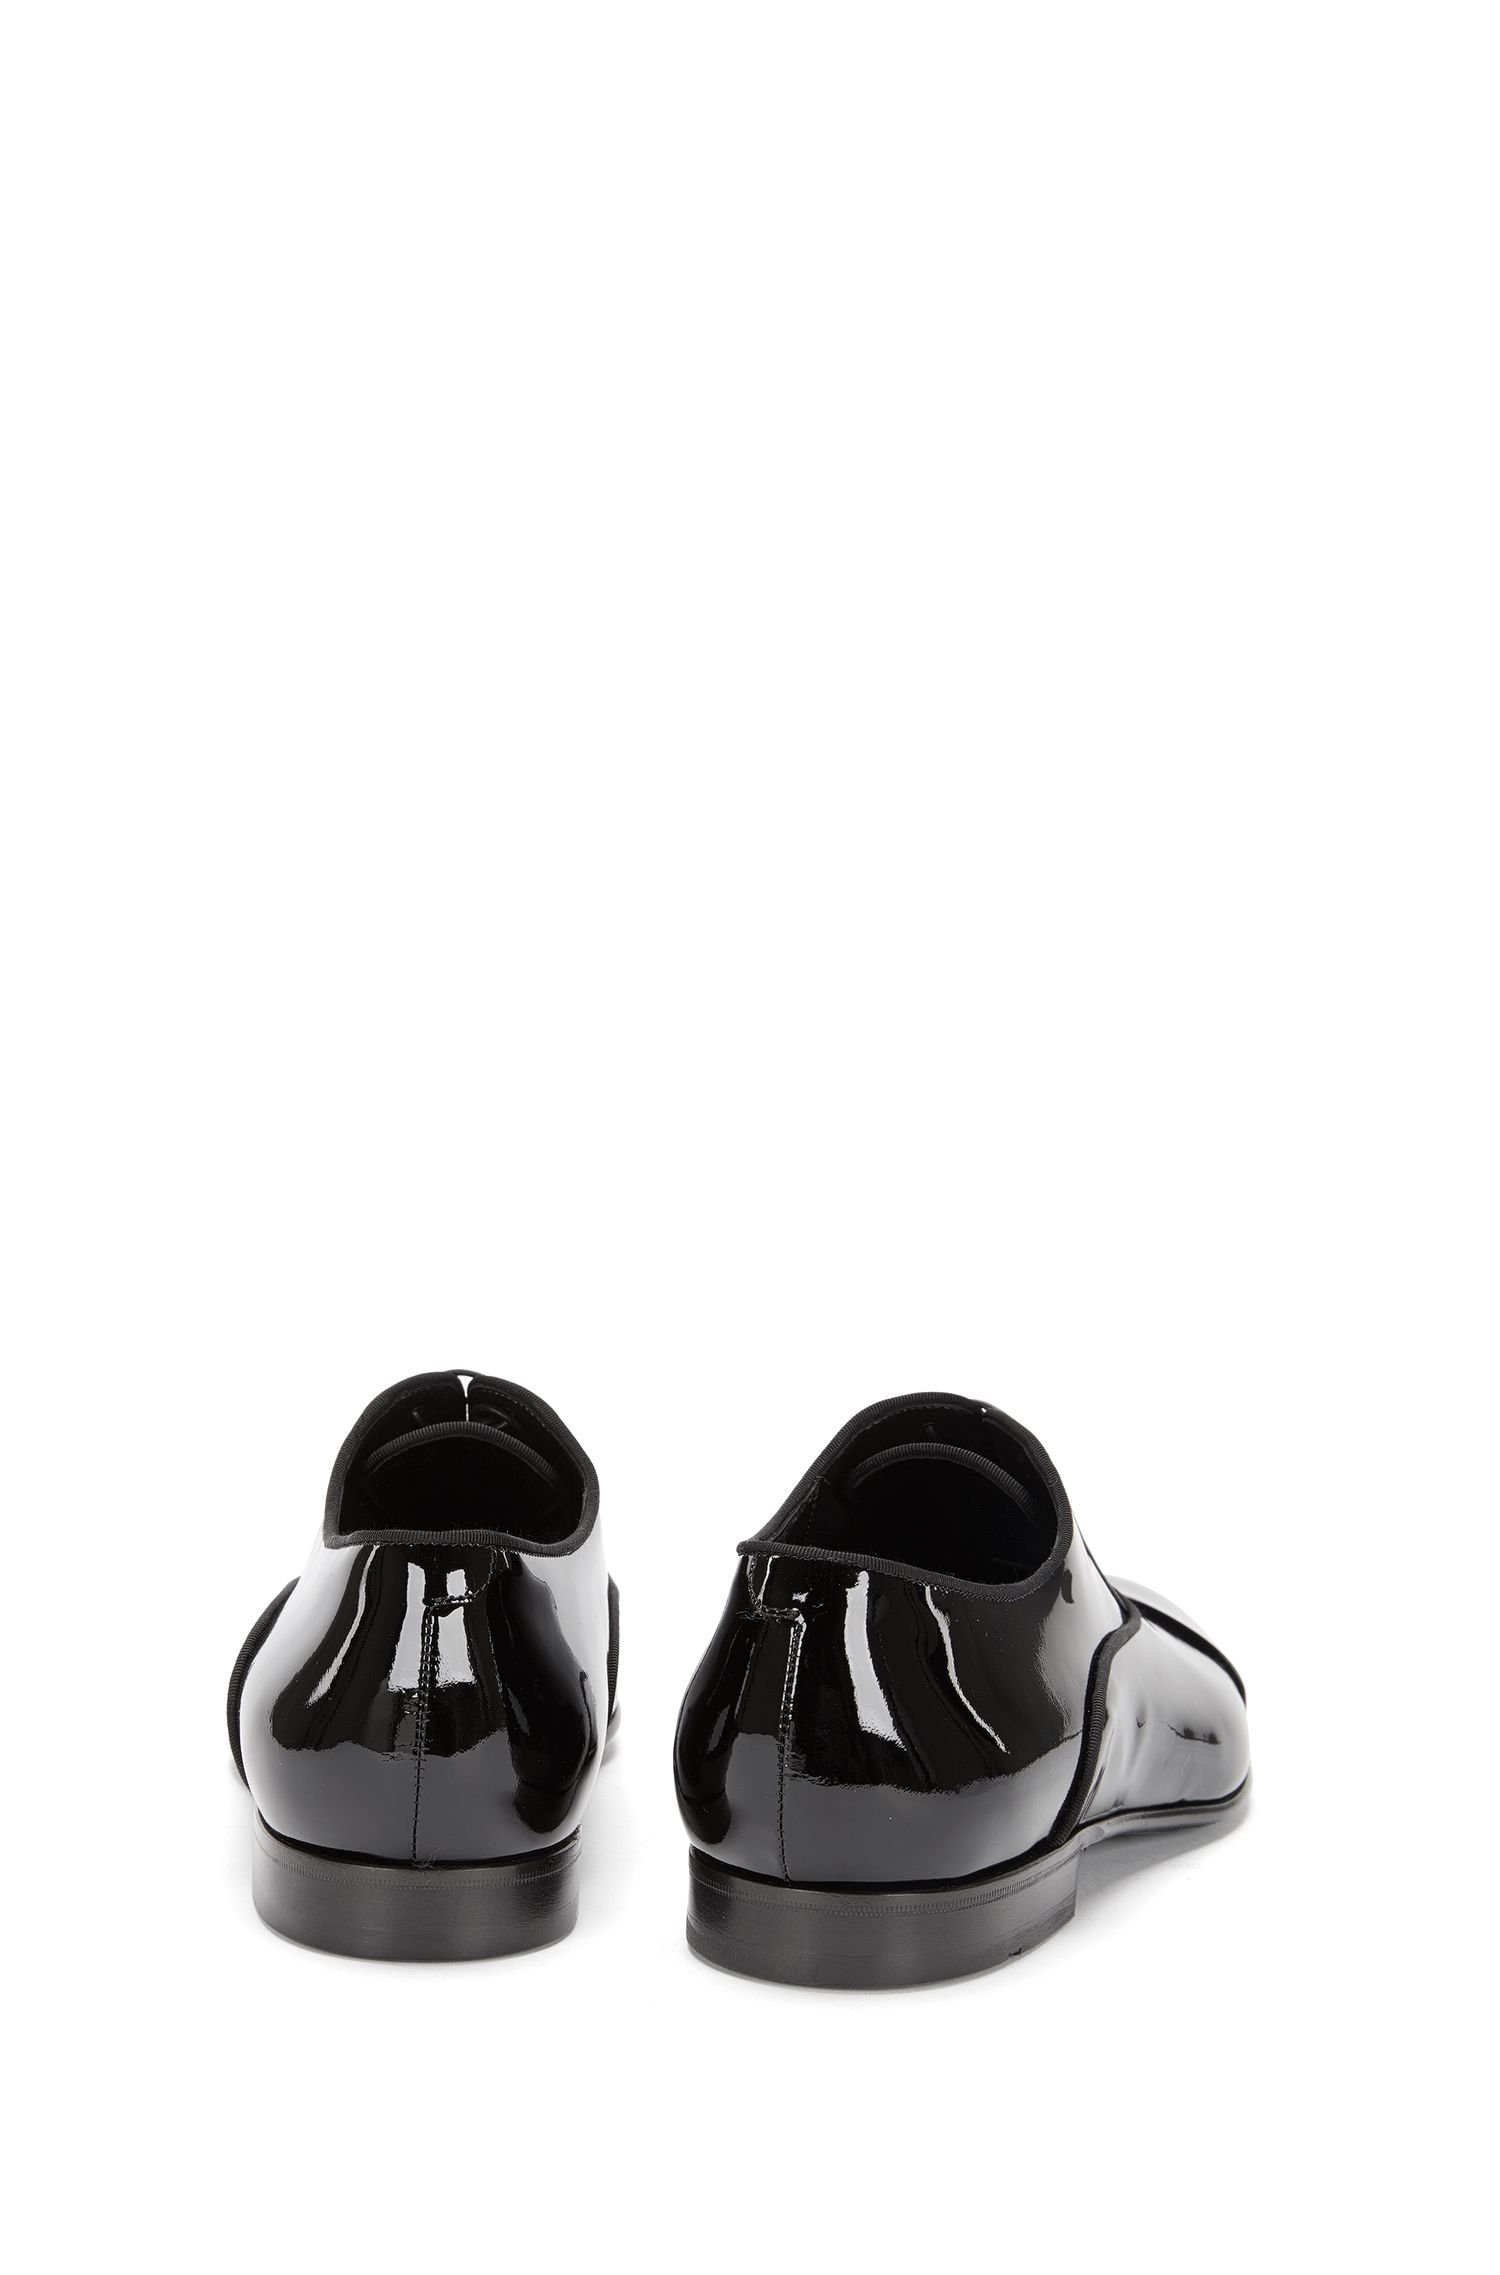 Italian Patent Leather Oxford Dress Shoe | Evening Oxfr Patct, Black